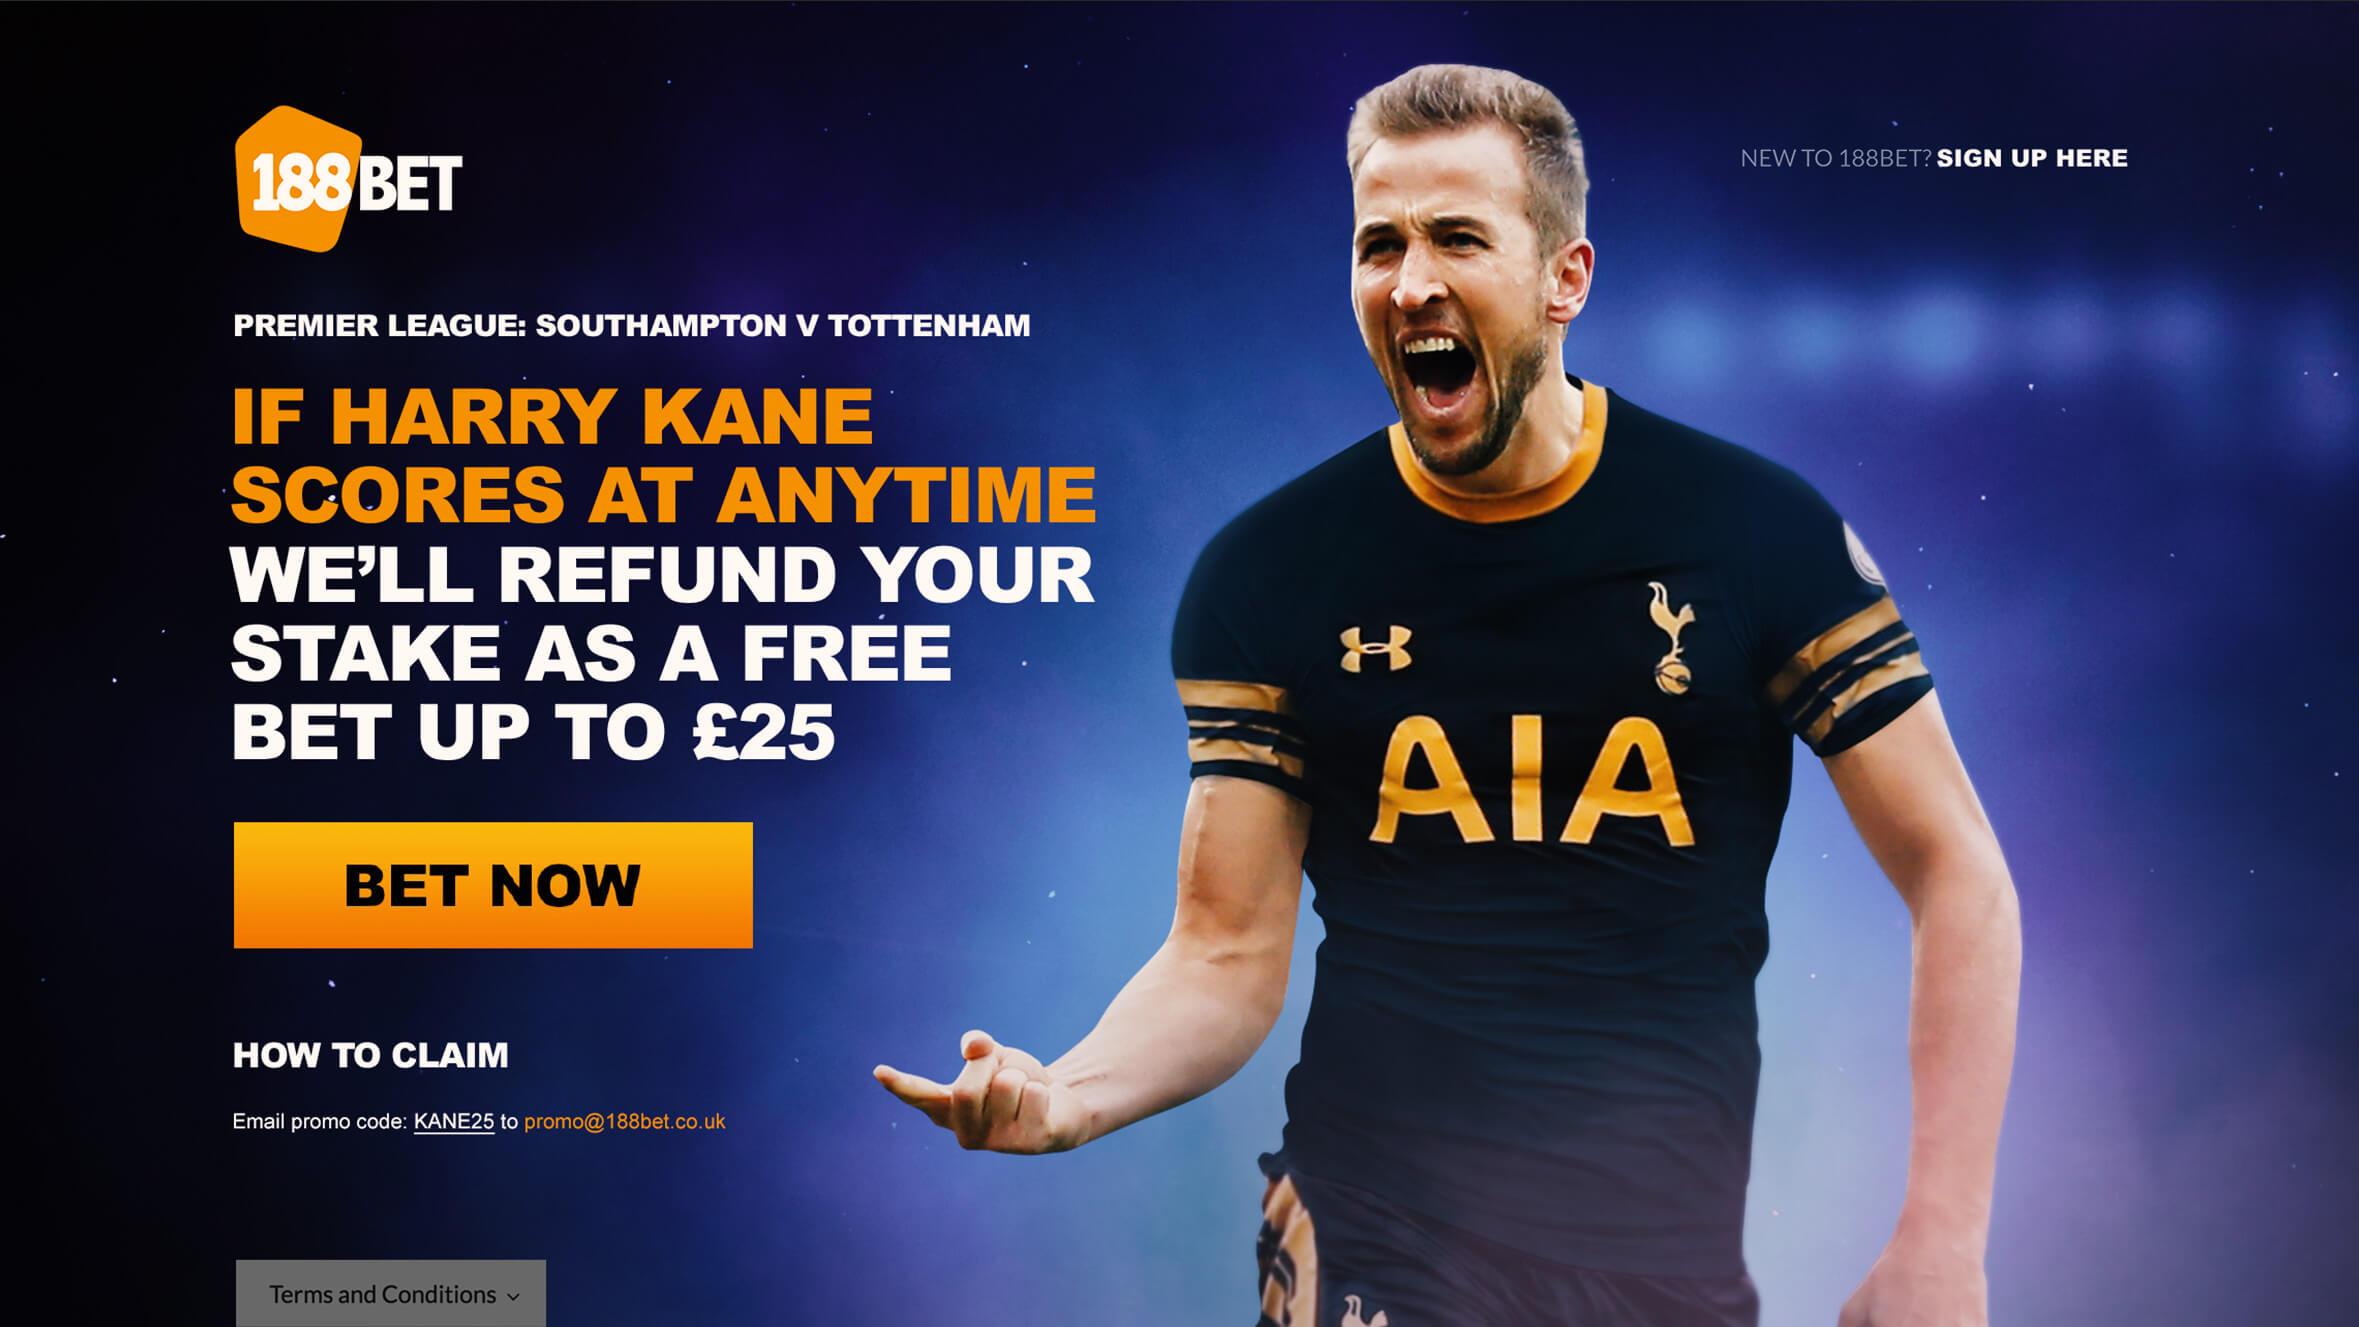 subscription based football betting